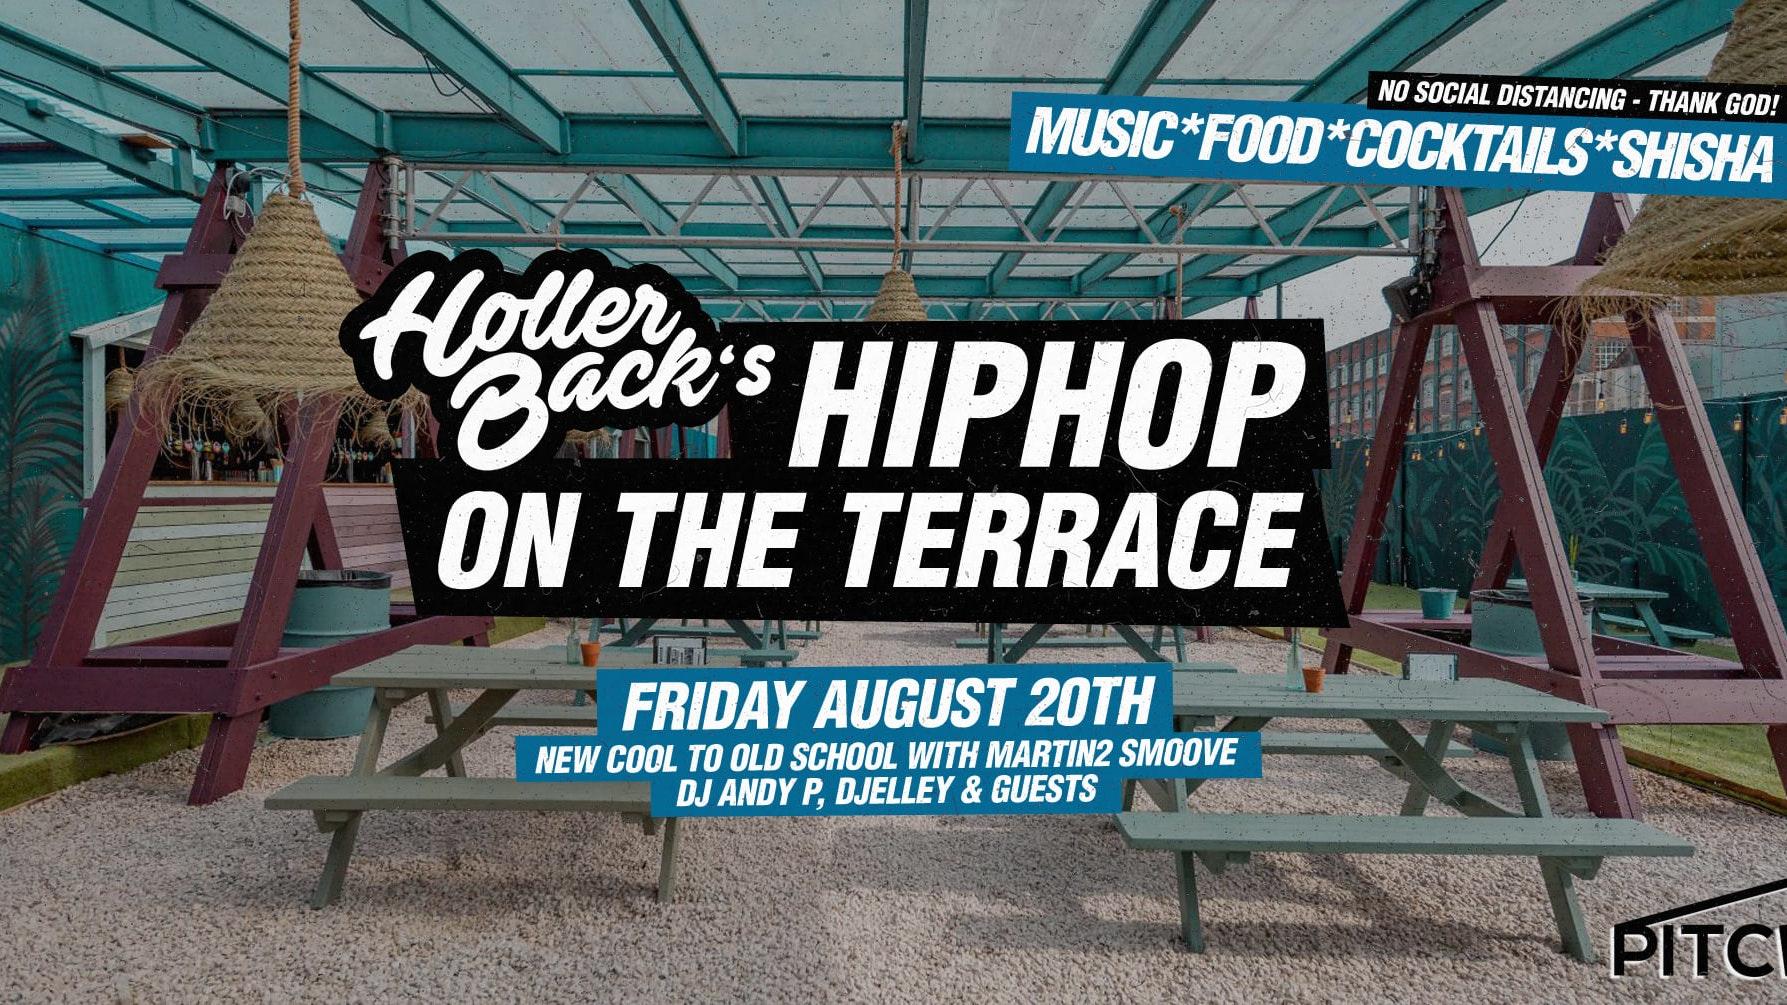 Holler Back London – Hip Hop & R'NB Summer Terrace Party 😎 August 20th 💃